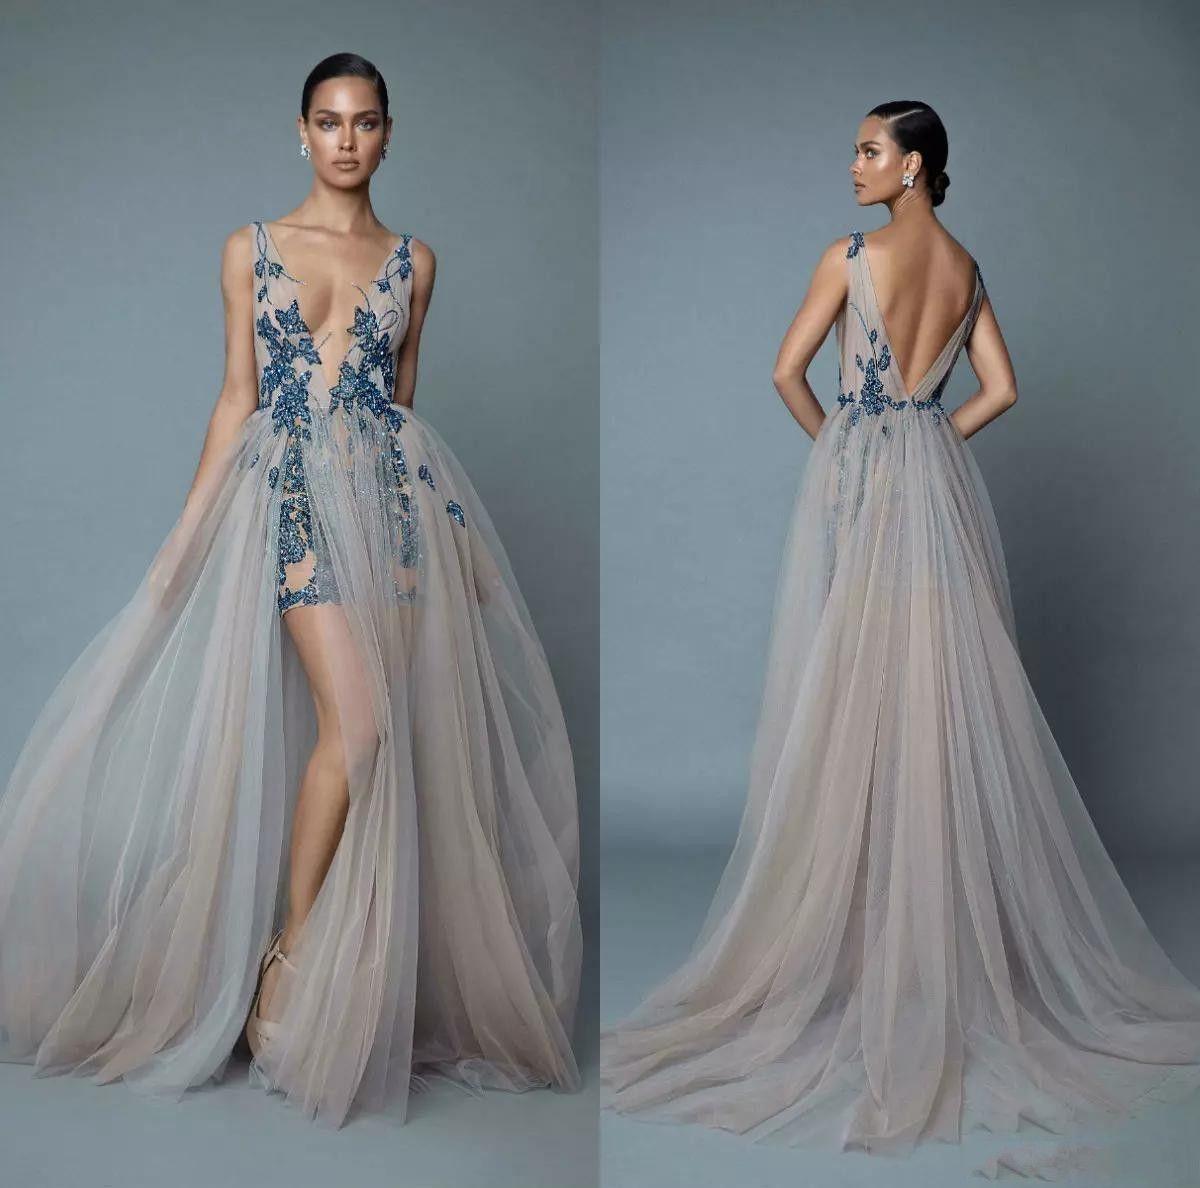 Großhandel Berta Abendkleider Party Wear Abendkleider Günstige Abendkleid  Festzug Kleider Spitze Vestidos De Noiva V Ausschnitt Side Split Von